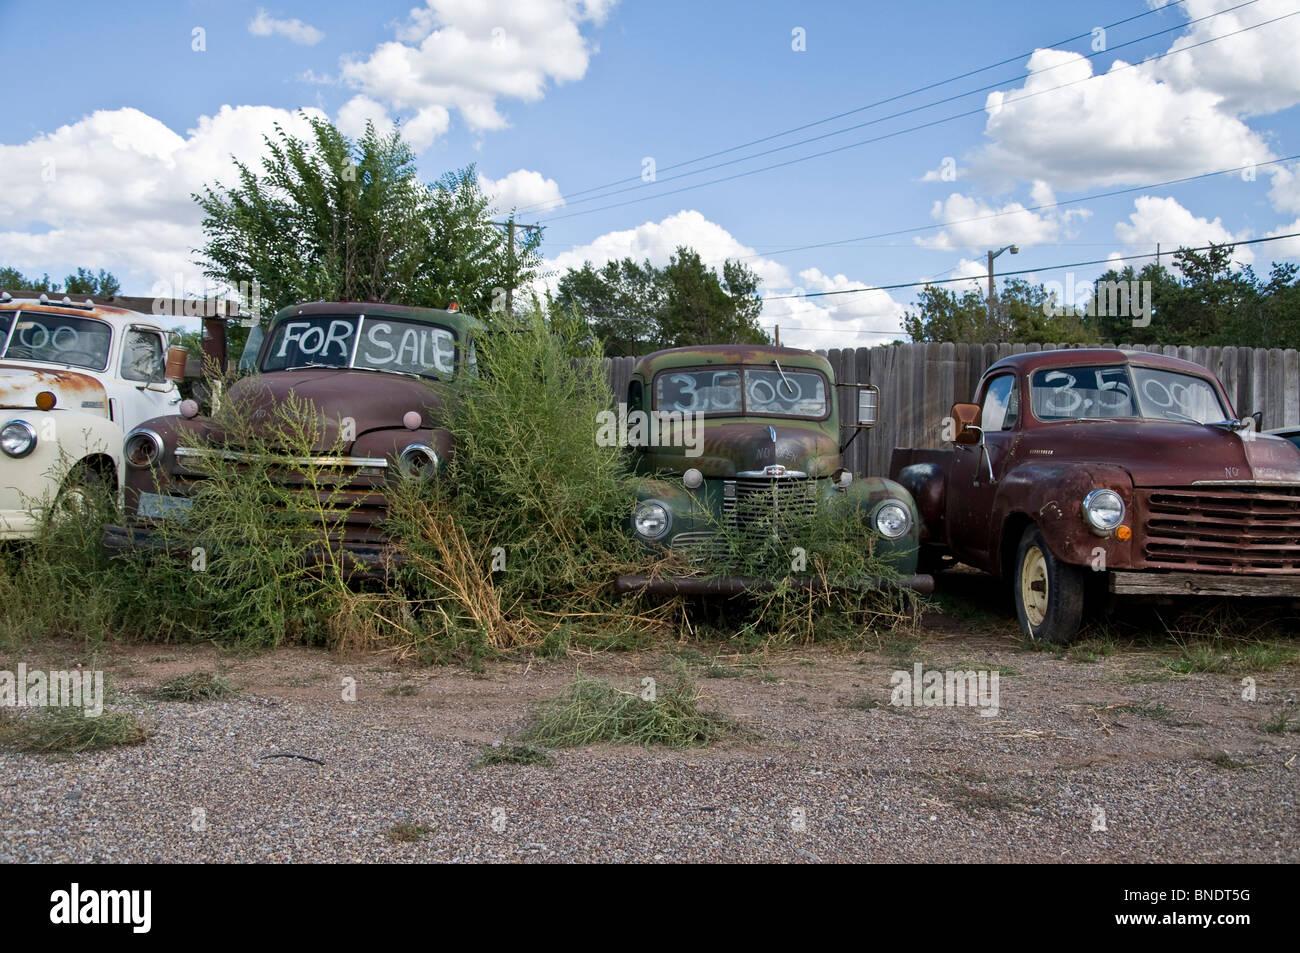 Rusty Cars For Sale, Tijeras, Route 66, Albuquerque, New